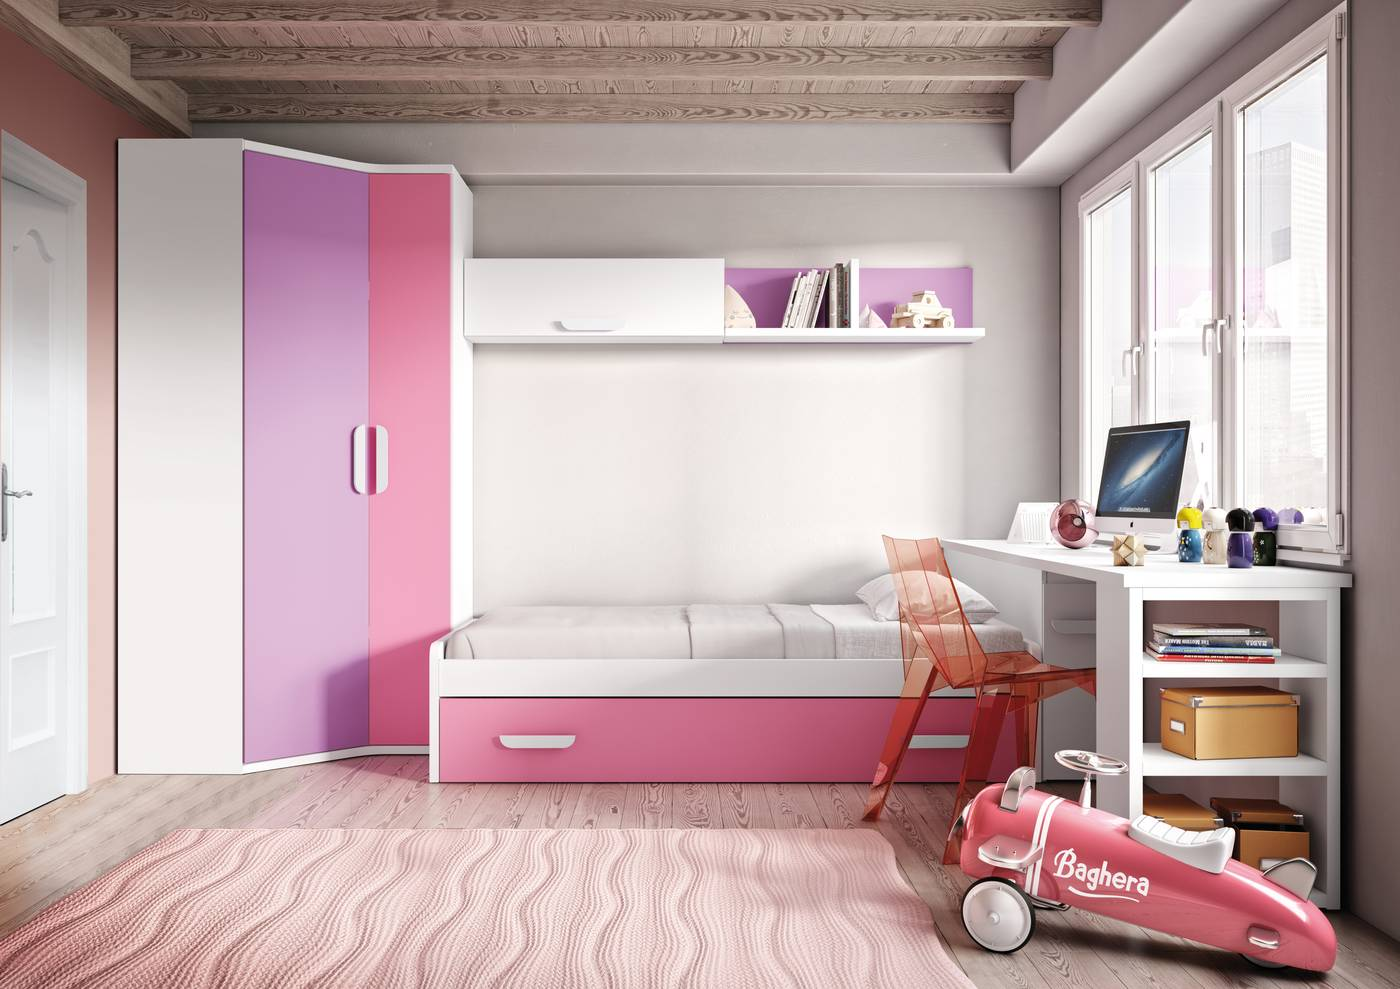 Habitacion Juvenil Xa 18 Dormitorio Juvenil Online Ofertas De